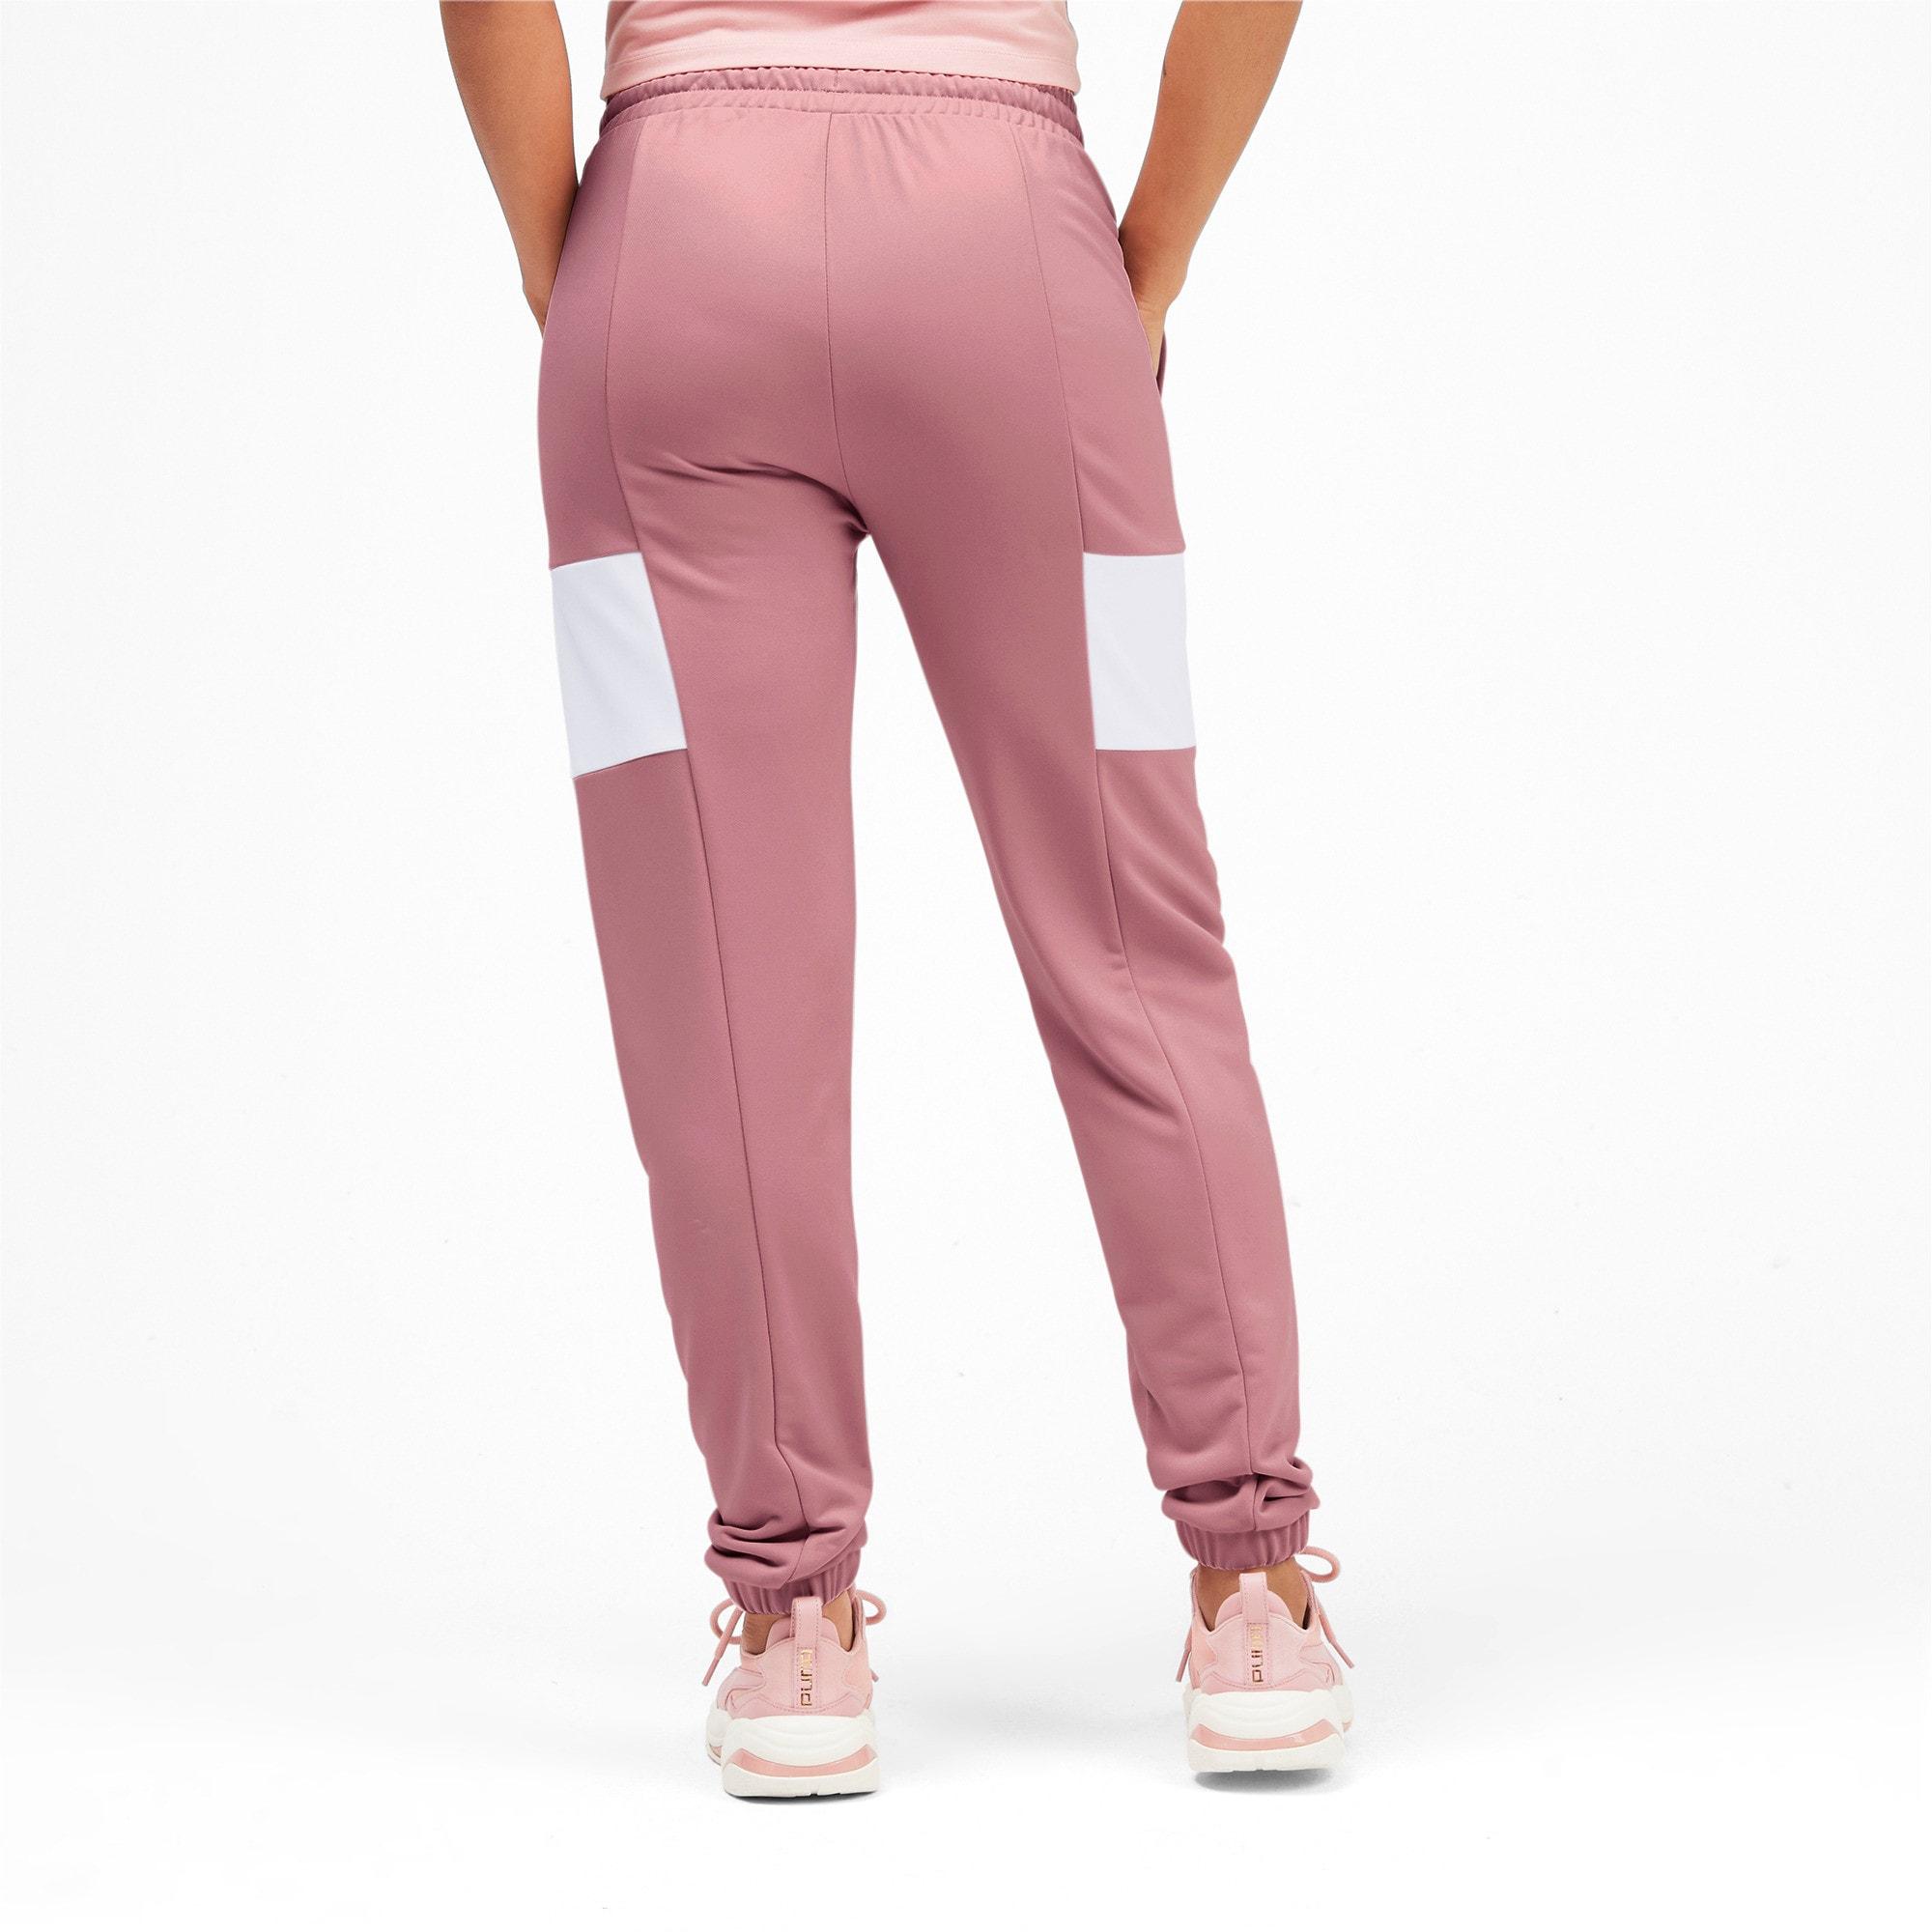 Miniatura 3 de Pantalones deportivos PUMA XTG para mujer, Bridal Rose, mediano